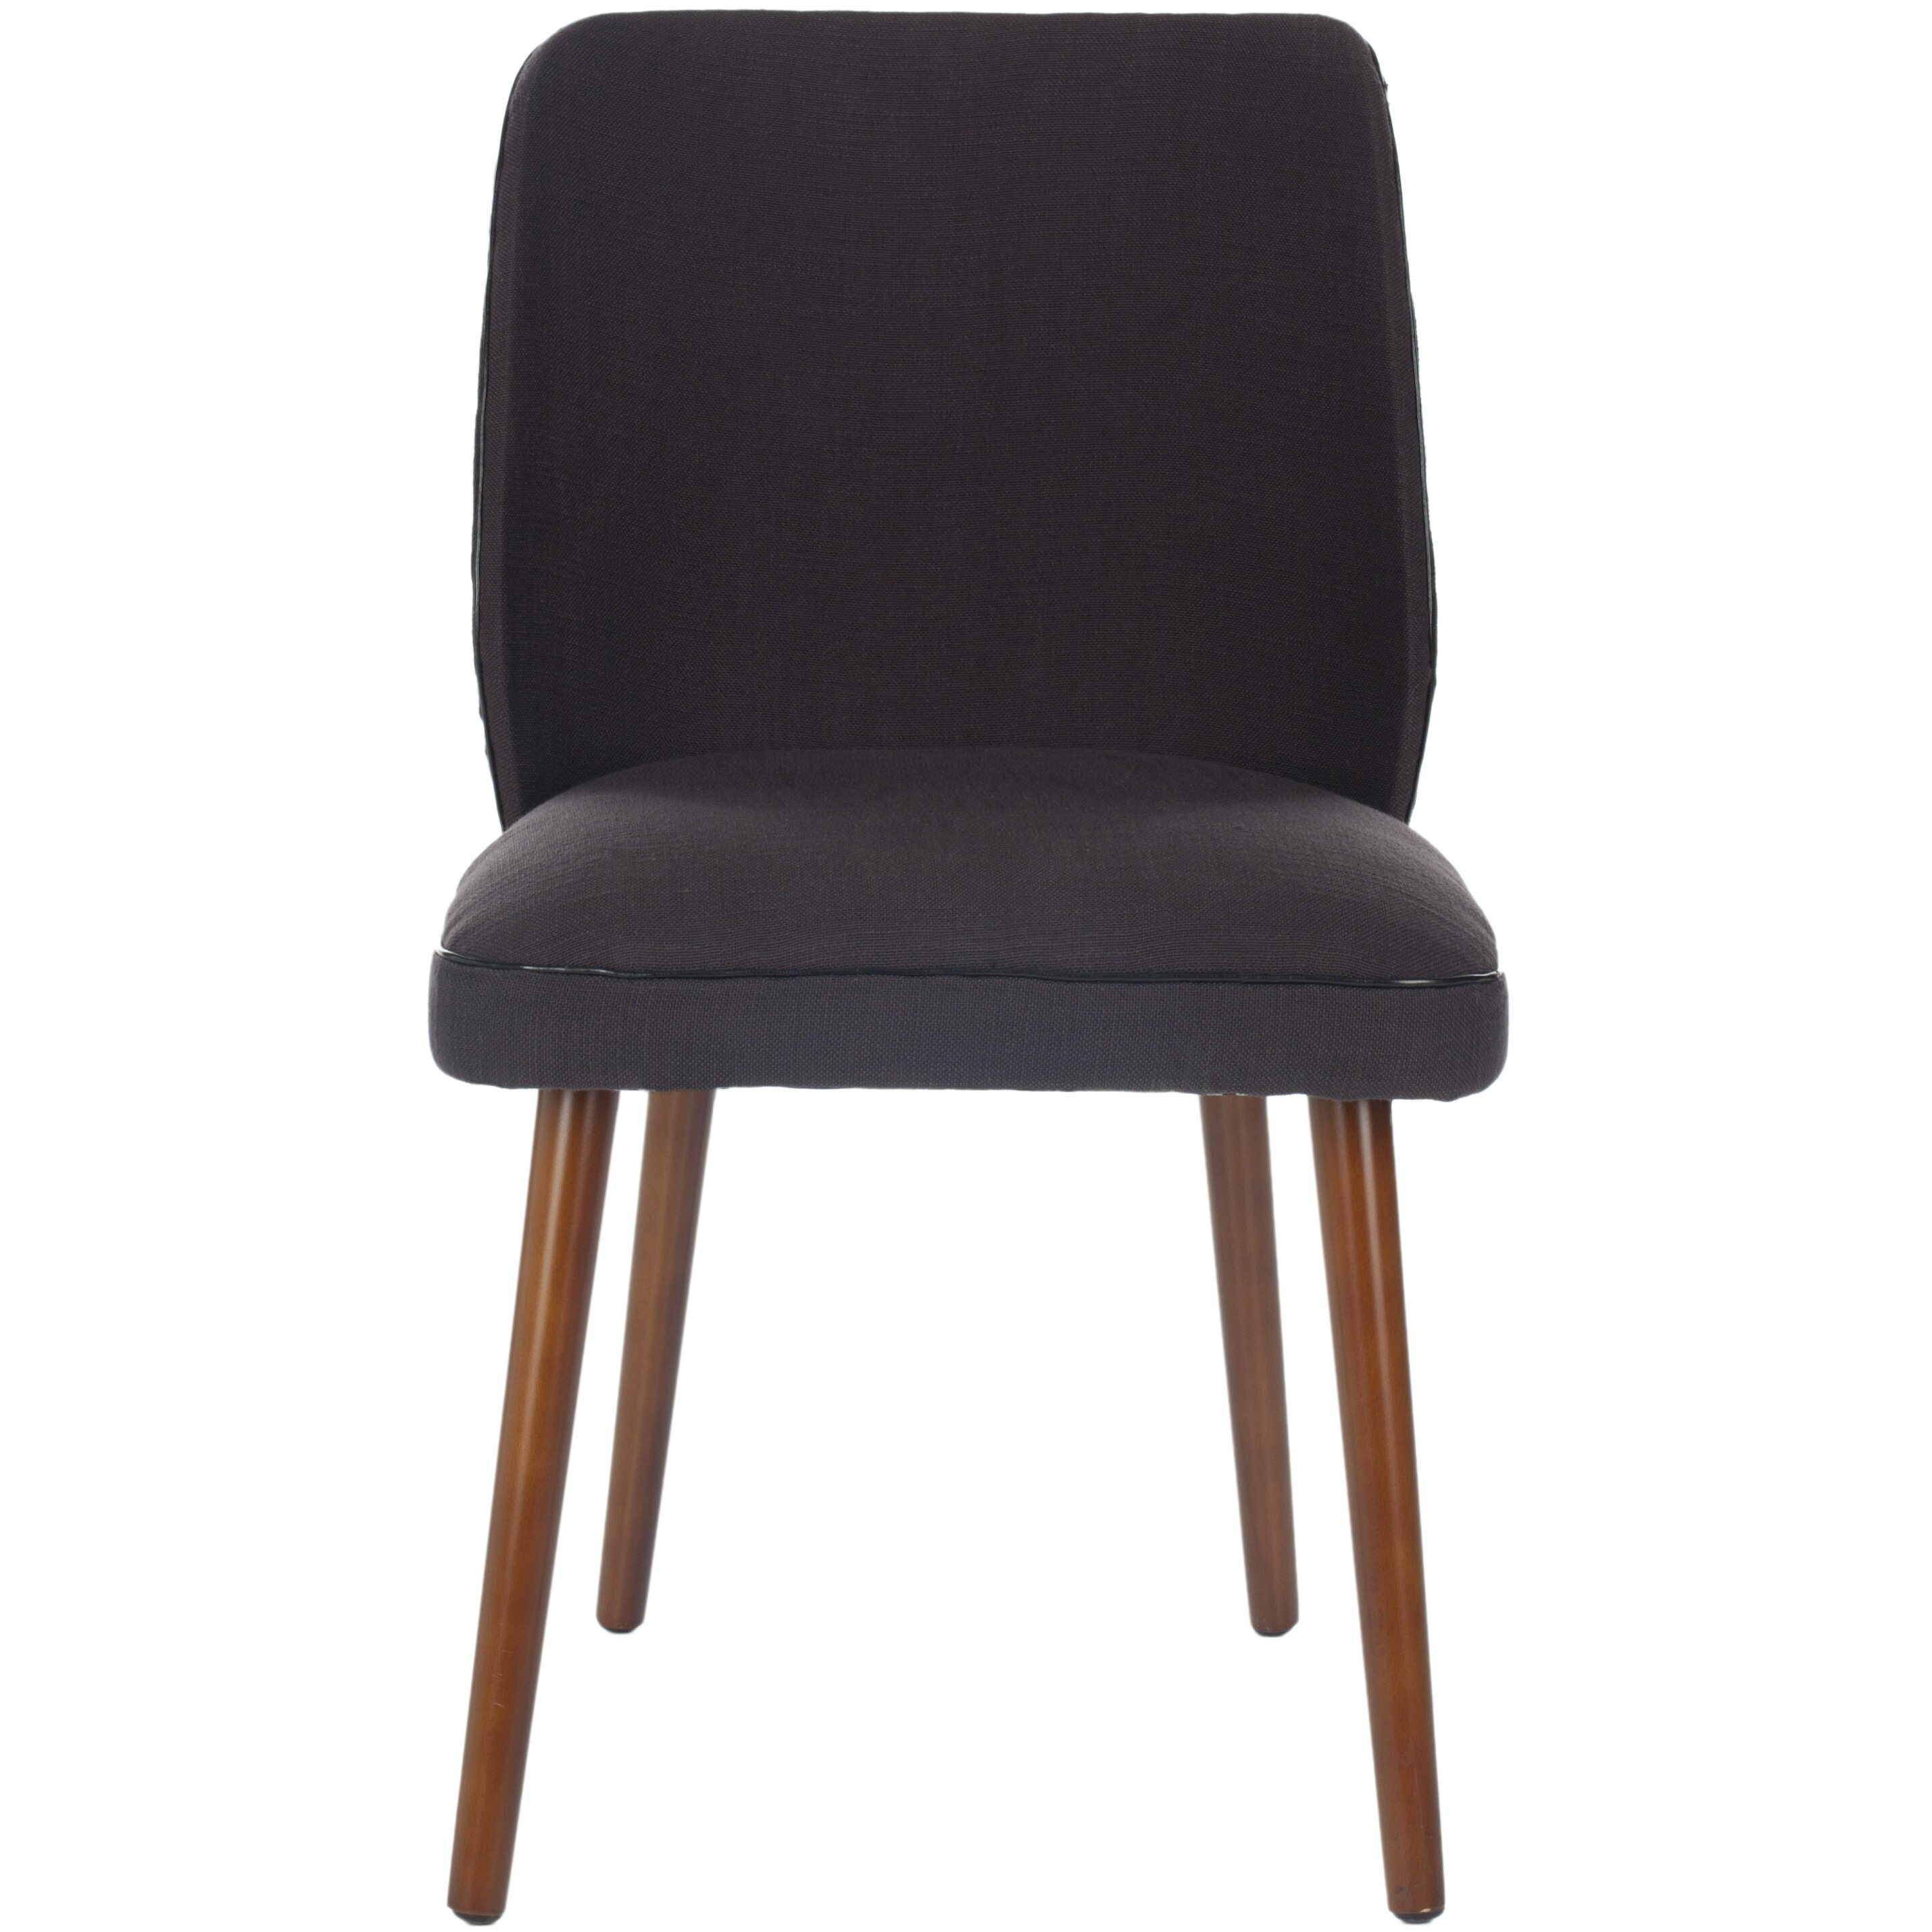 safavieh vernon upholstered dining chair. Black Bedroom Furniture Sets. Home Design Ideas